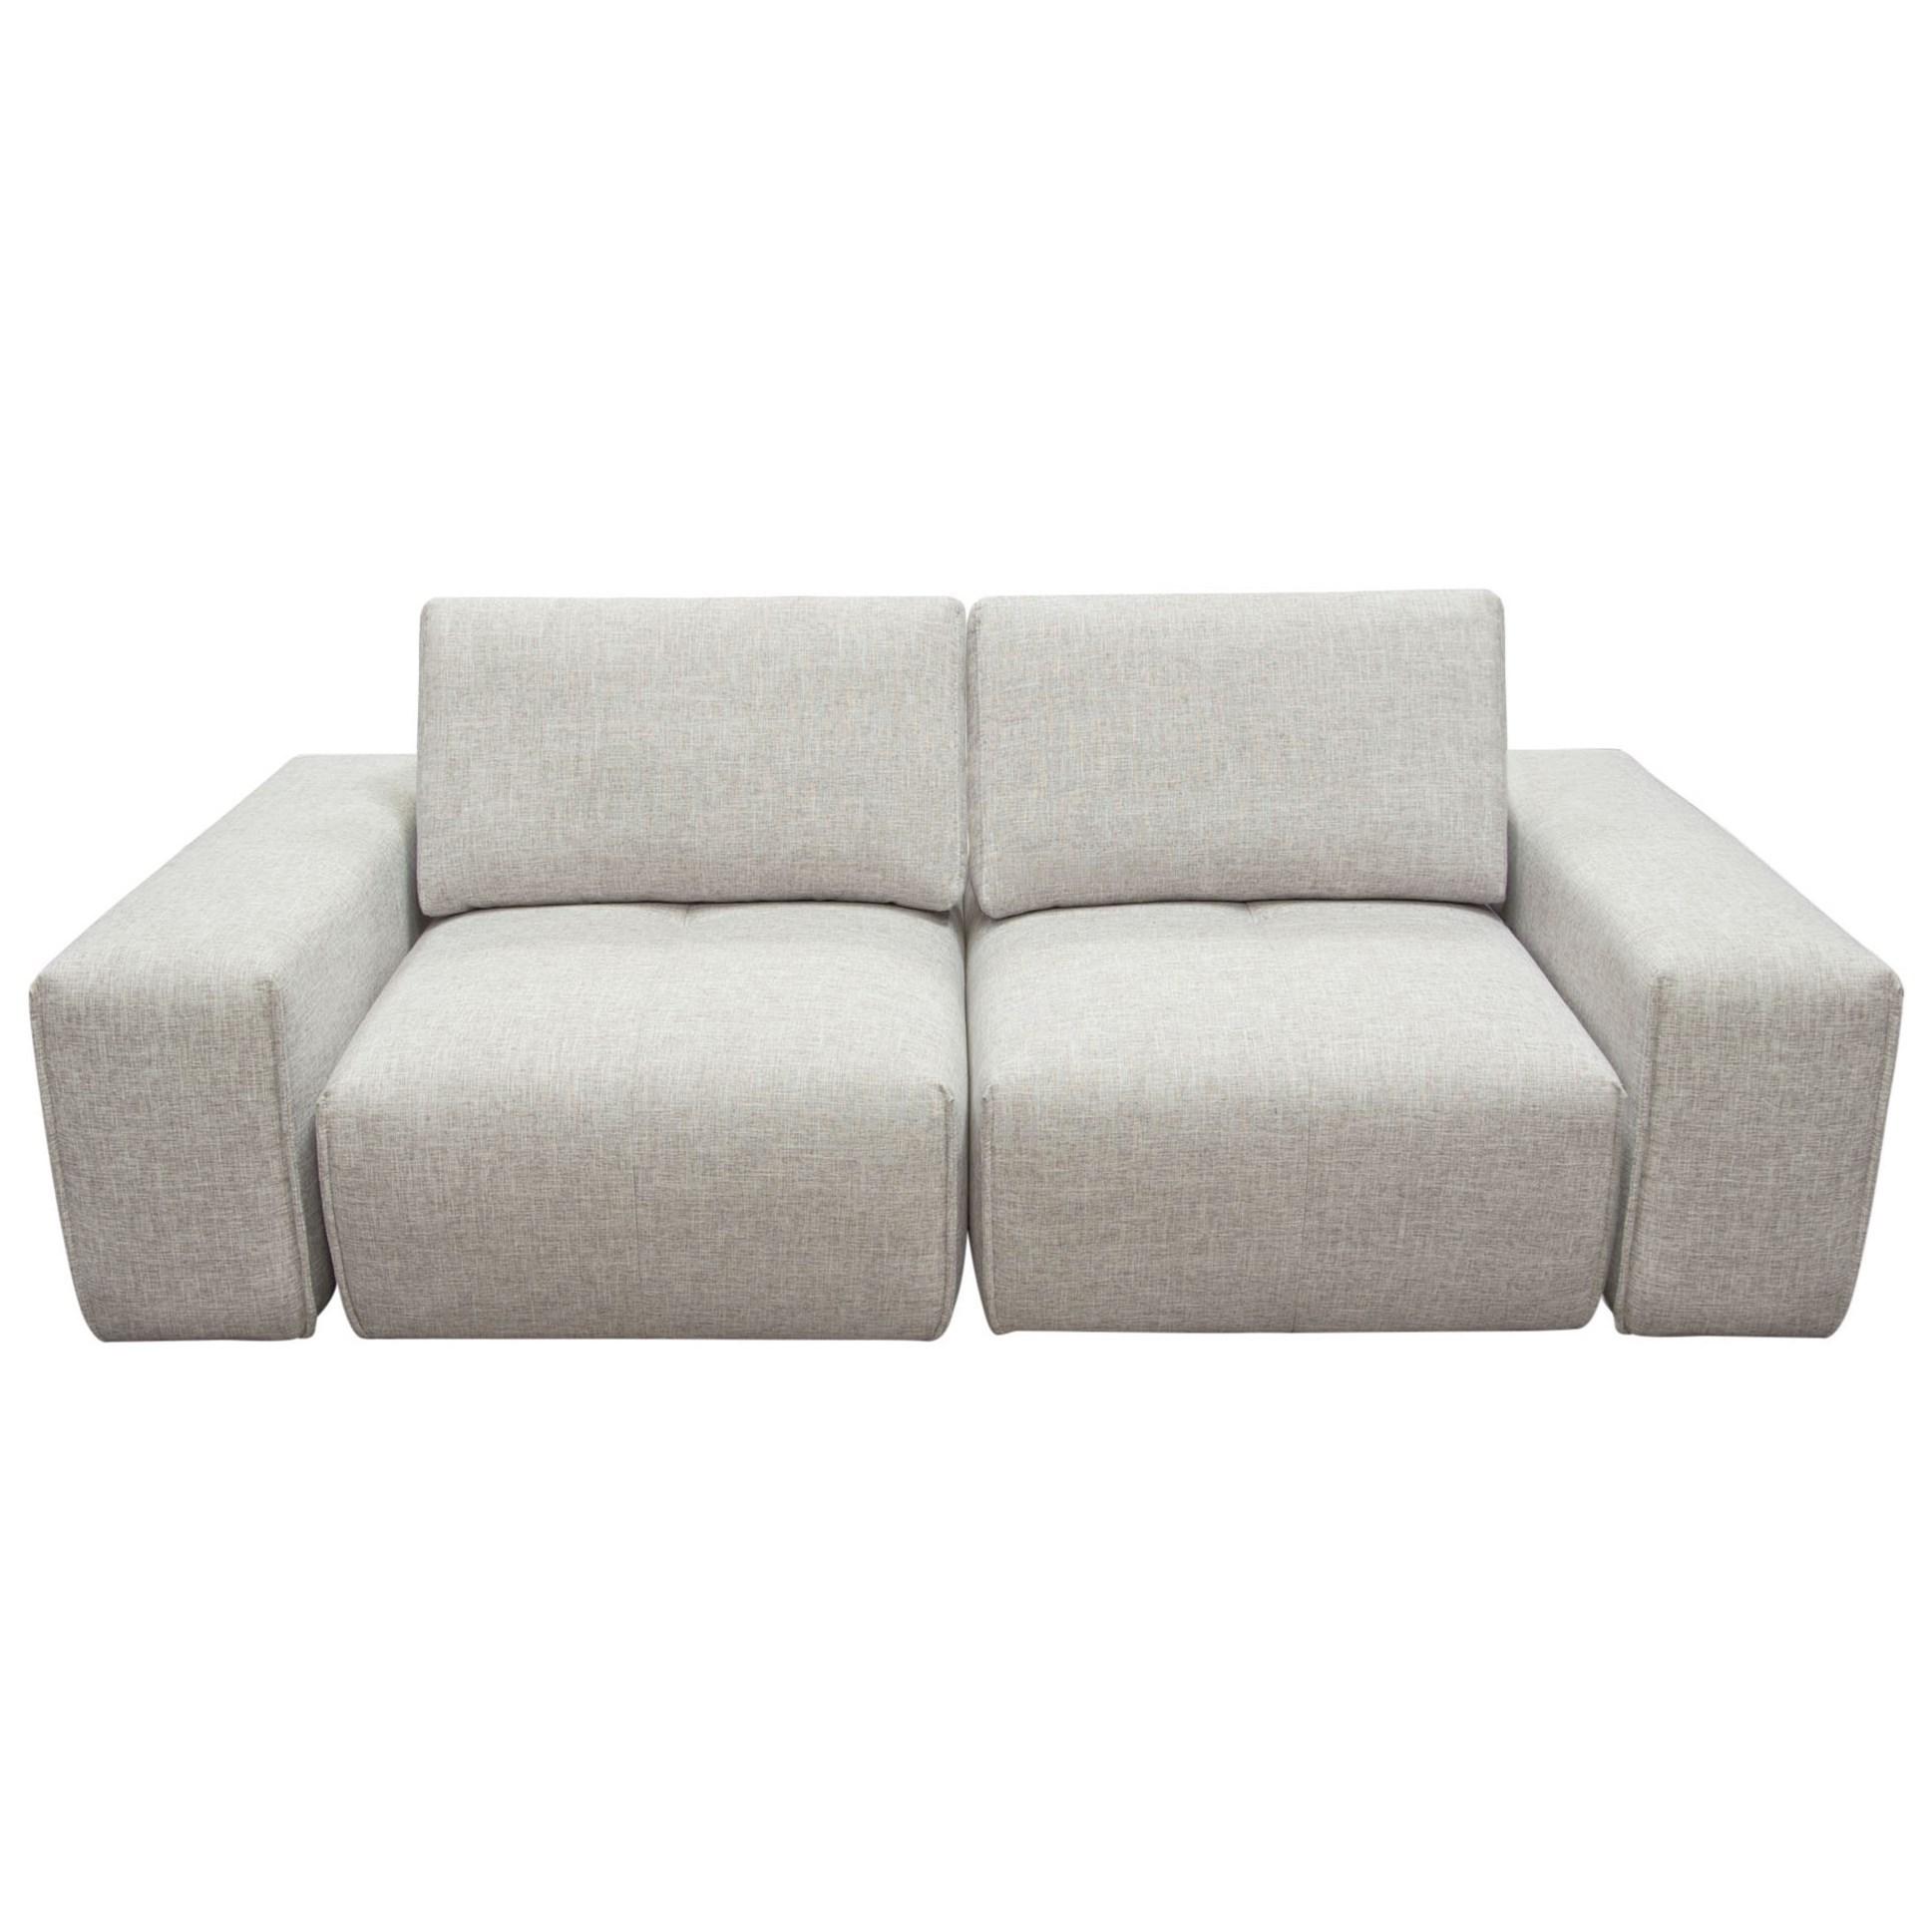 Jazz Loveseat by Diamond Sofa at HomeWorld Furniture